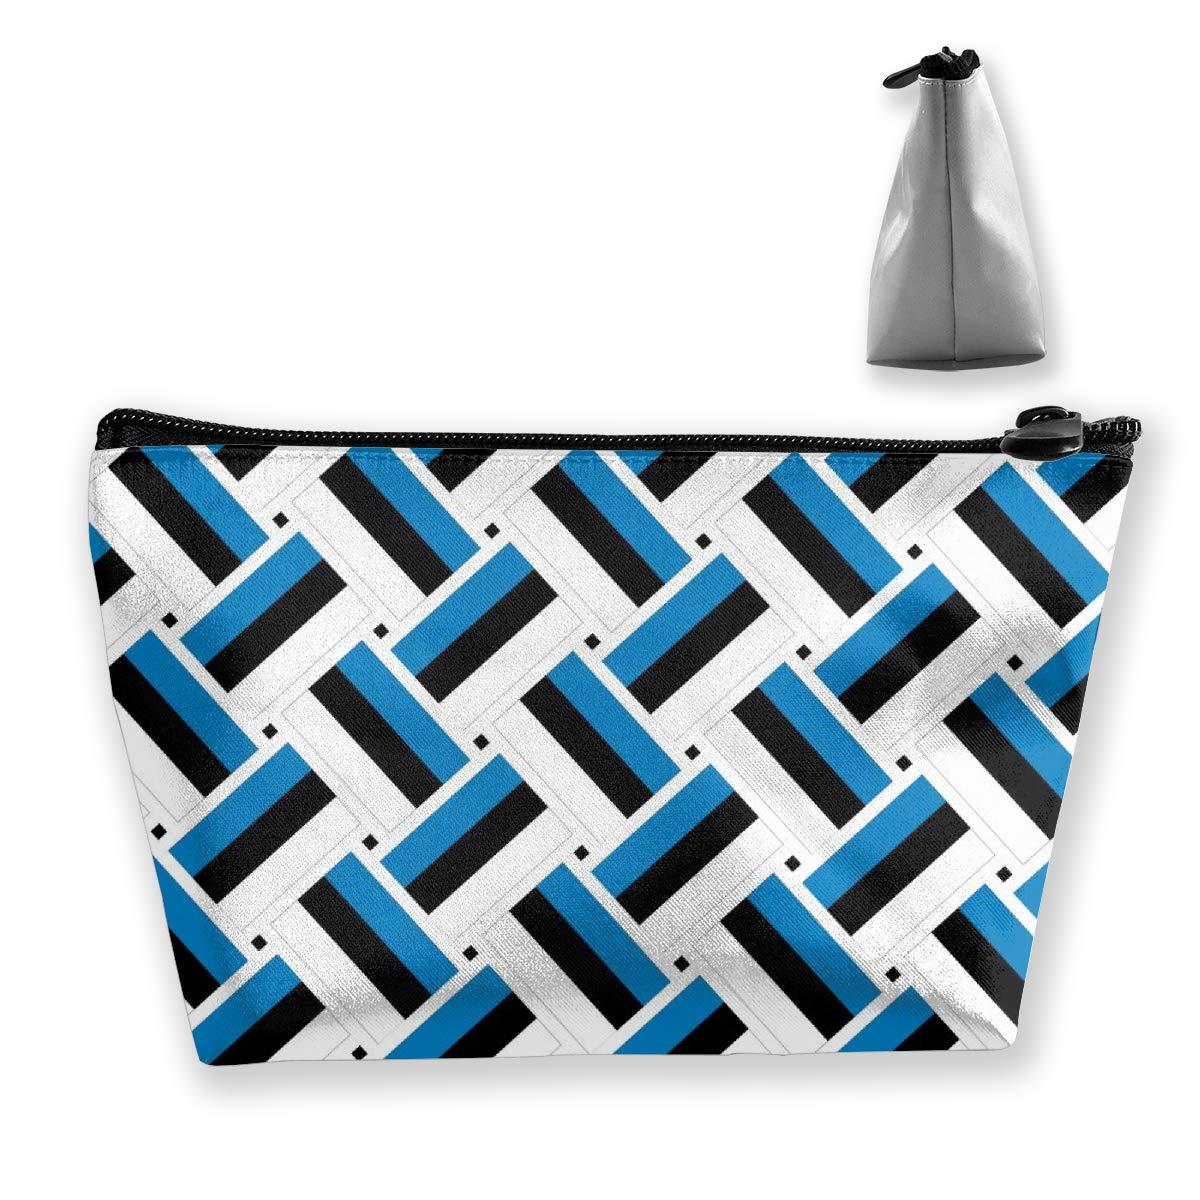 Lightweight Multi-Purpose Zipper Trapezoidal Storage Bag Organizer Pouch Small Cosmetic Makeup Bag Coin Cellphone Purse Pencil Pouch (Estonia Flag Weave)